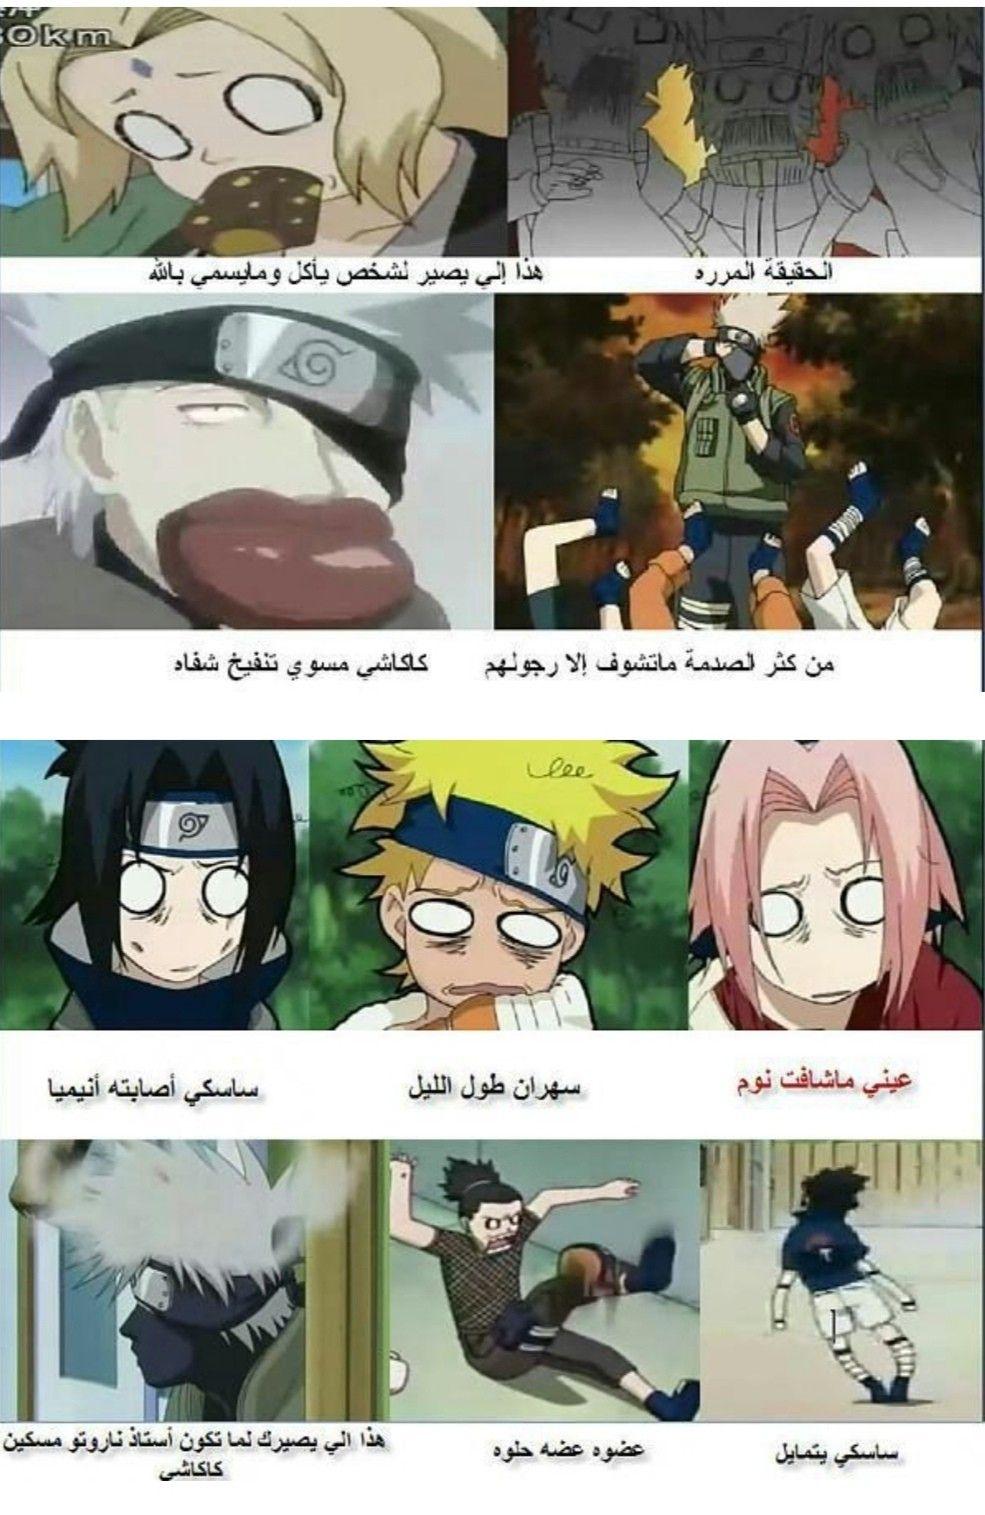 Pin By On تحشيش انمي Anime Jokes Anime Funny Anime Sketch